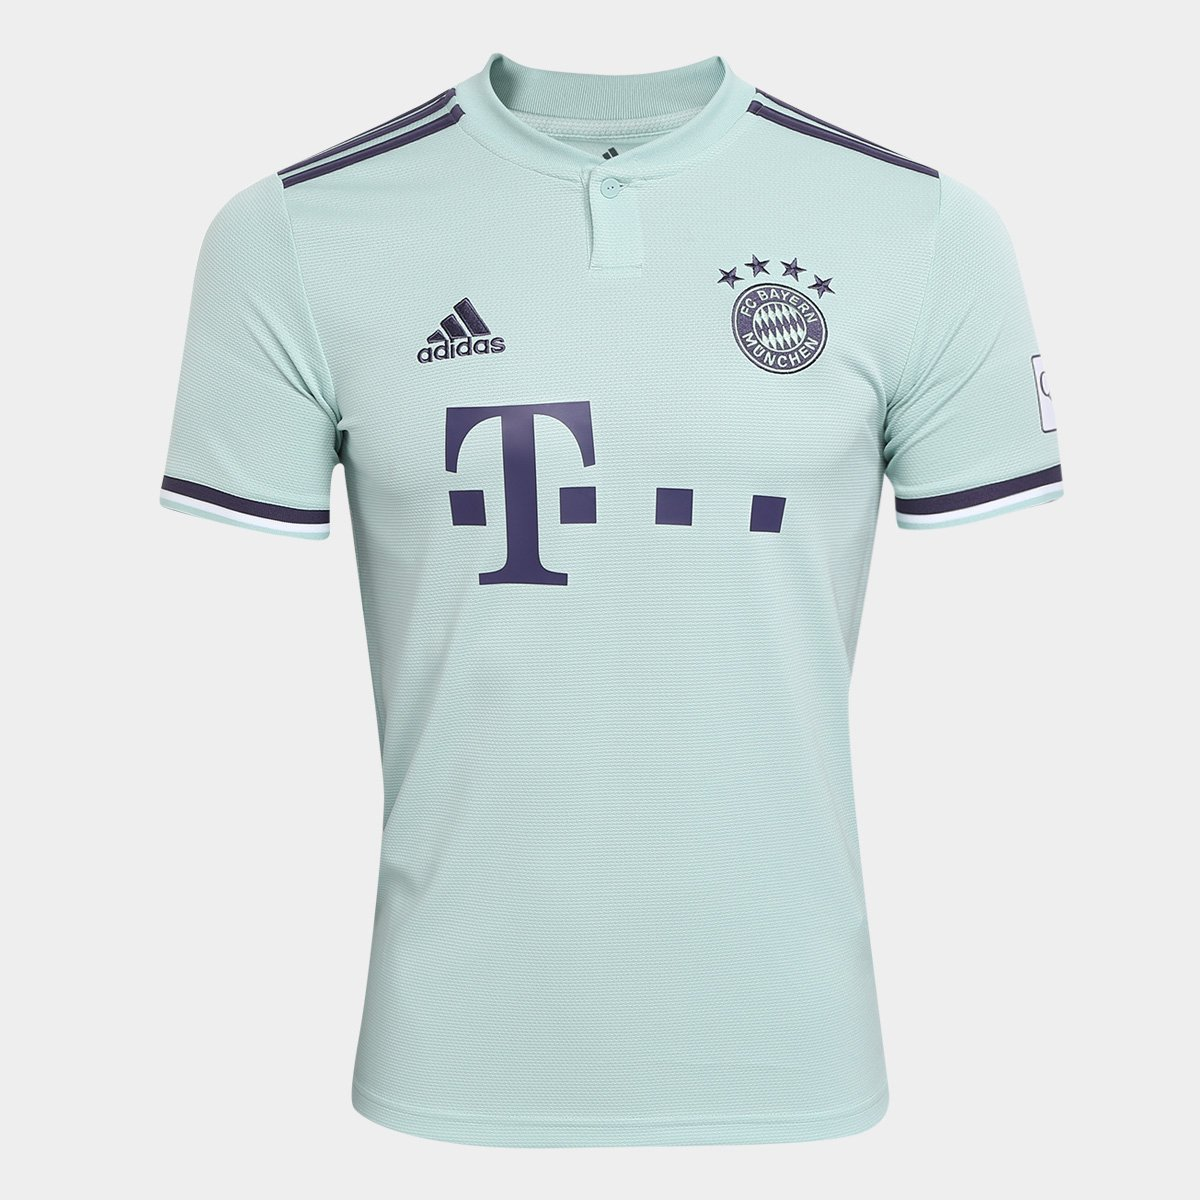 42f2a4de4 Camisa Bayern de Munique Away 2018 s/n° - Torcedor Adidas Masculina - Verde  claro | Allianz Parque Shop